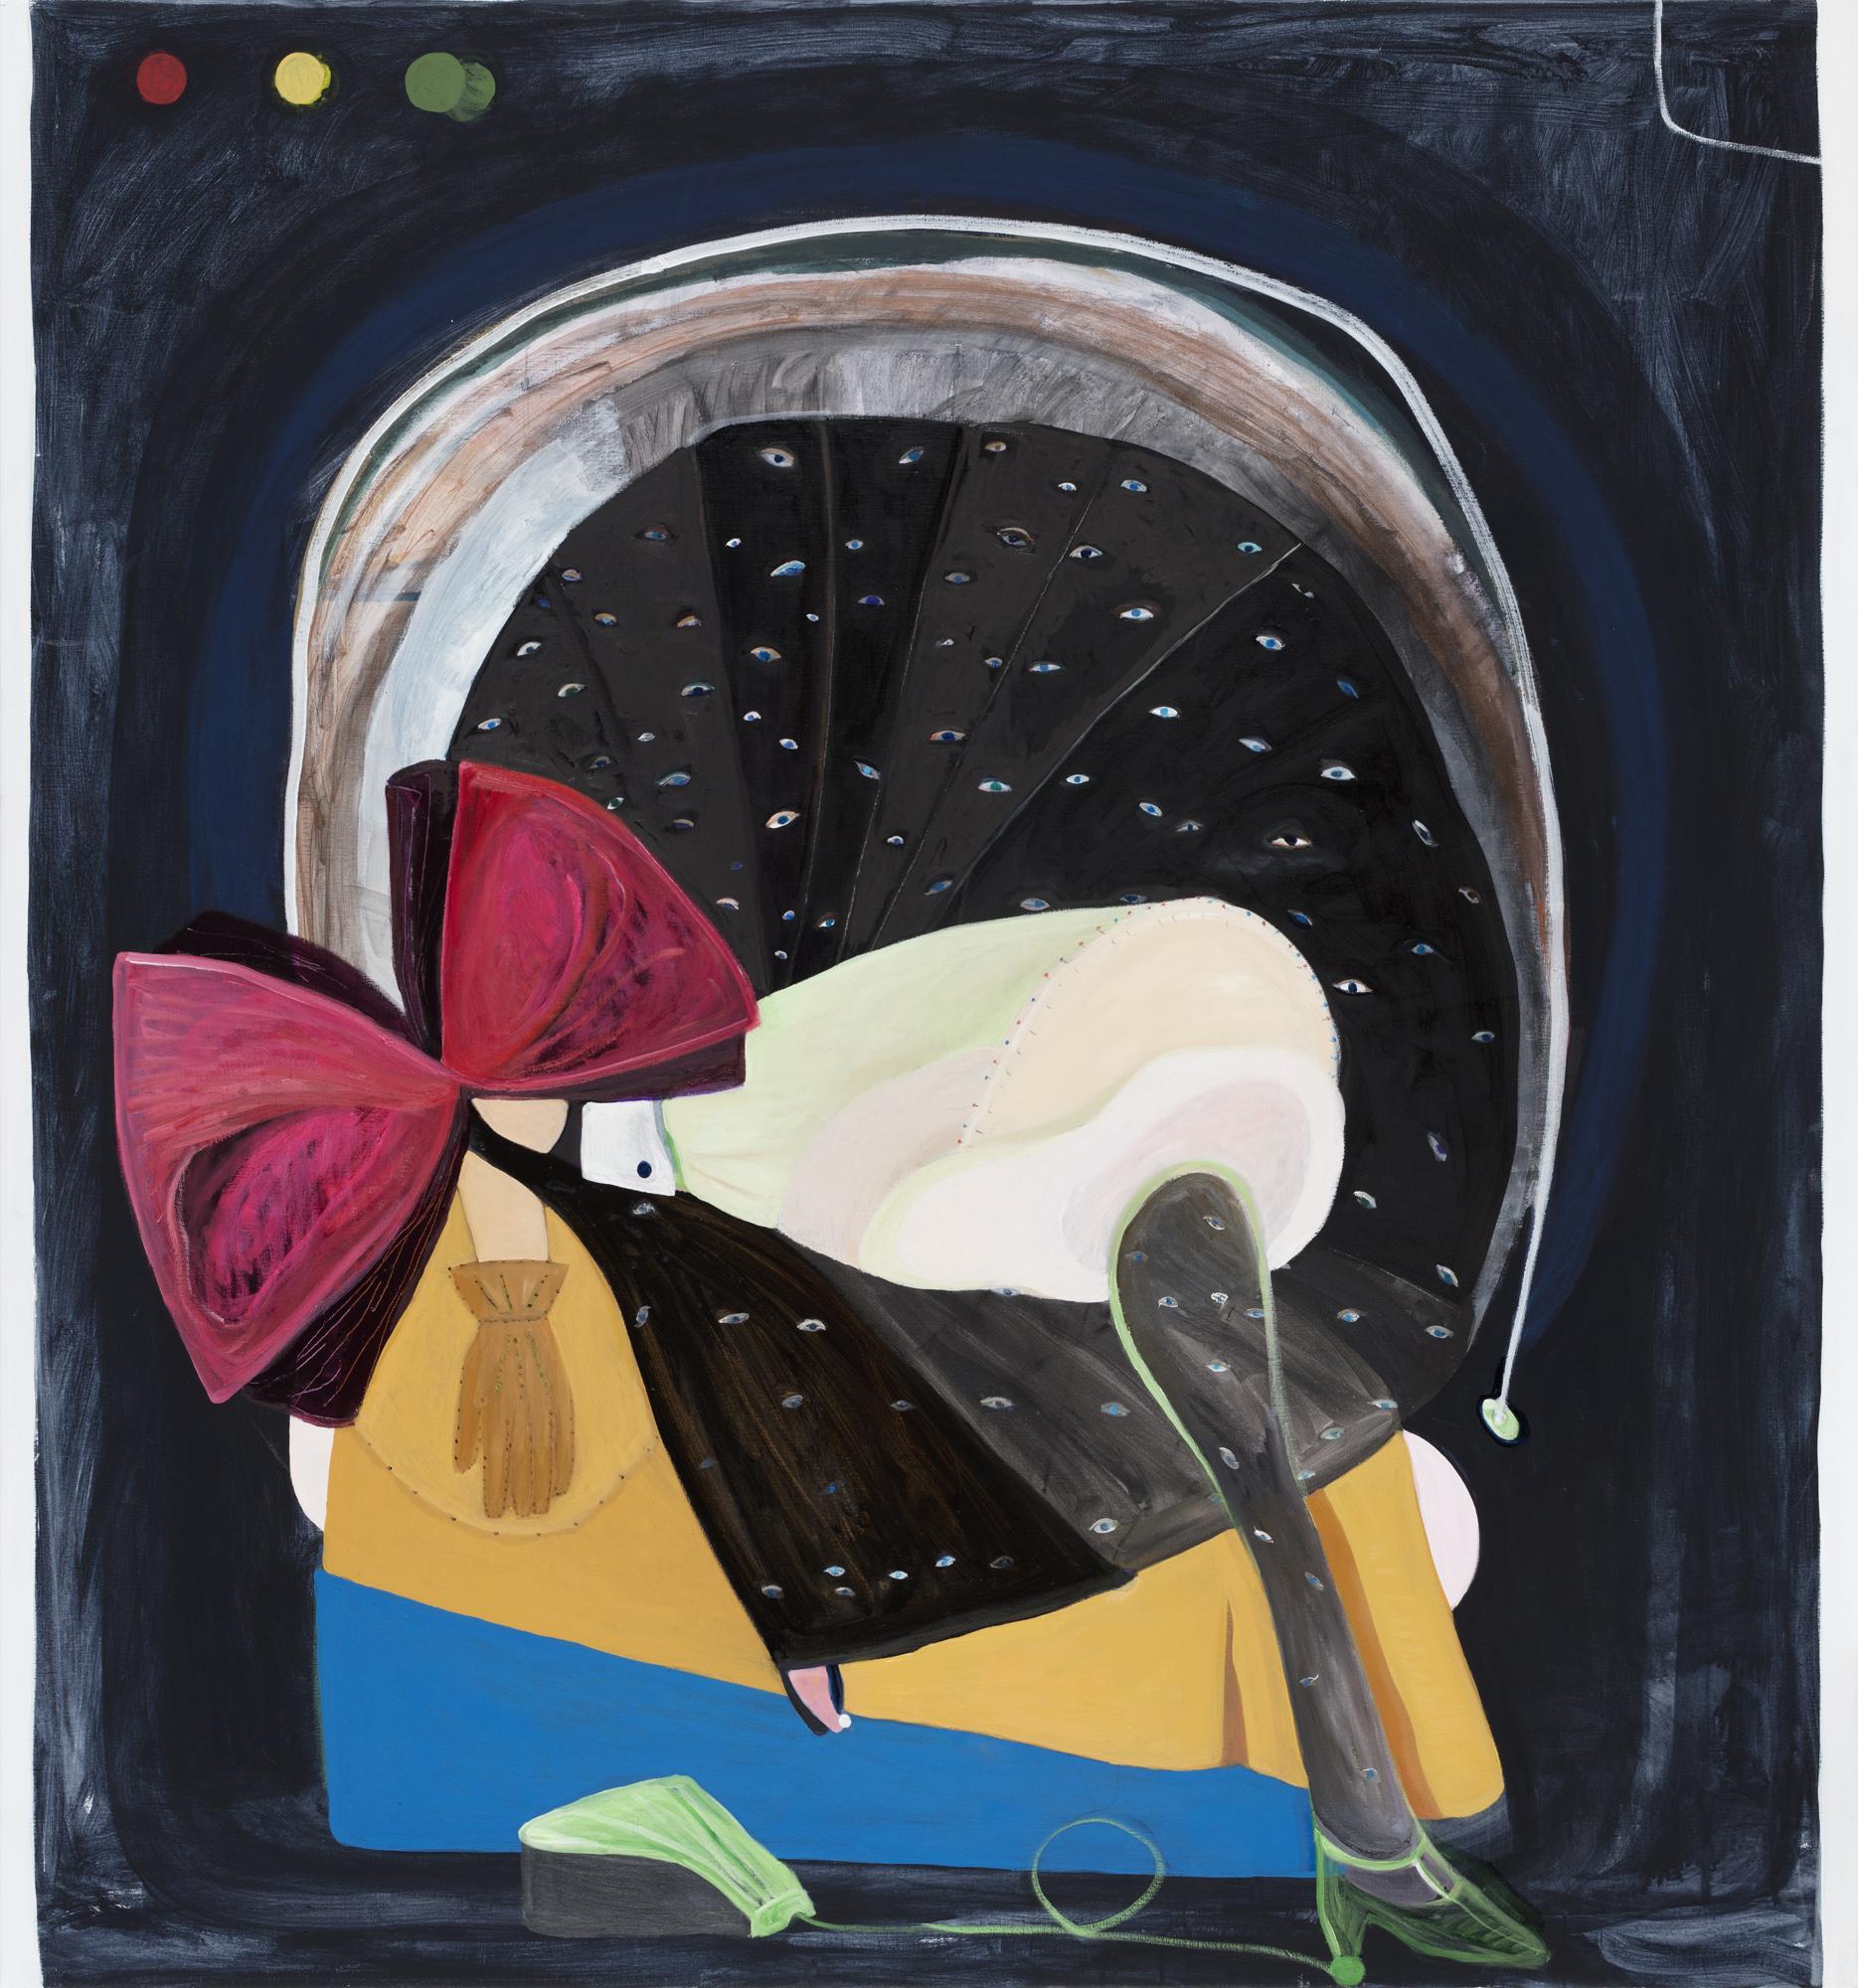 Pia Mauno  Bonsai    2019 Vinyl paint and oil on canvas 152 x 145 cm